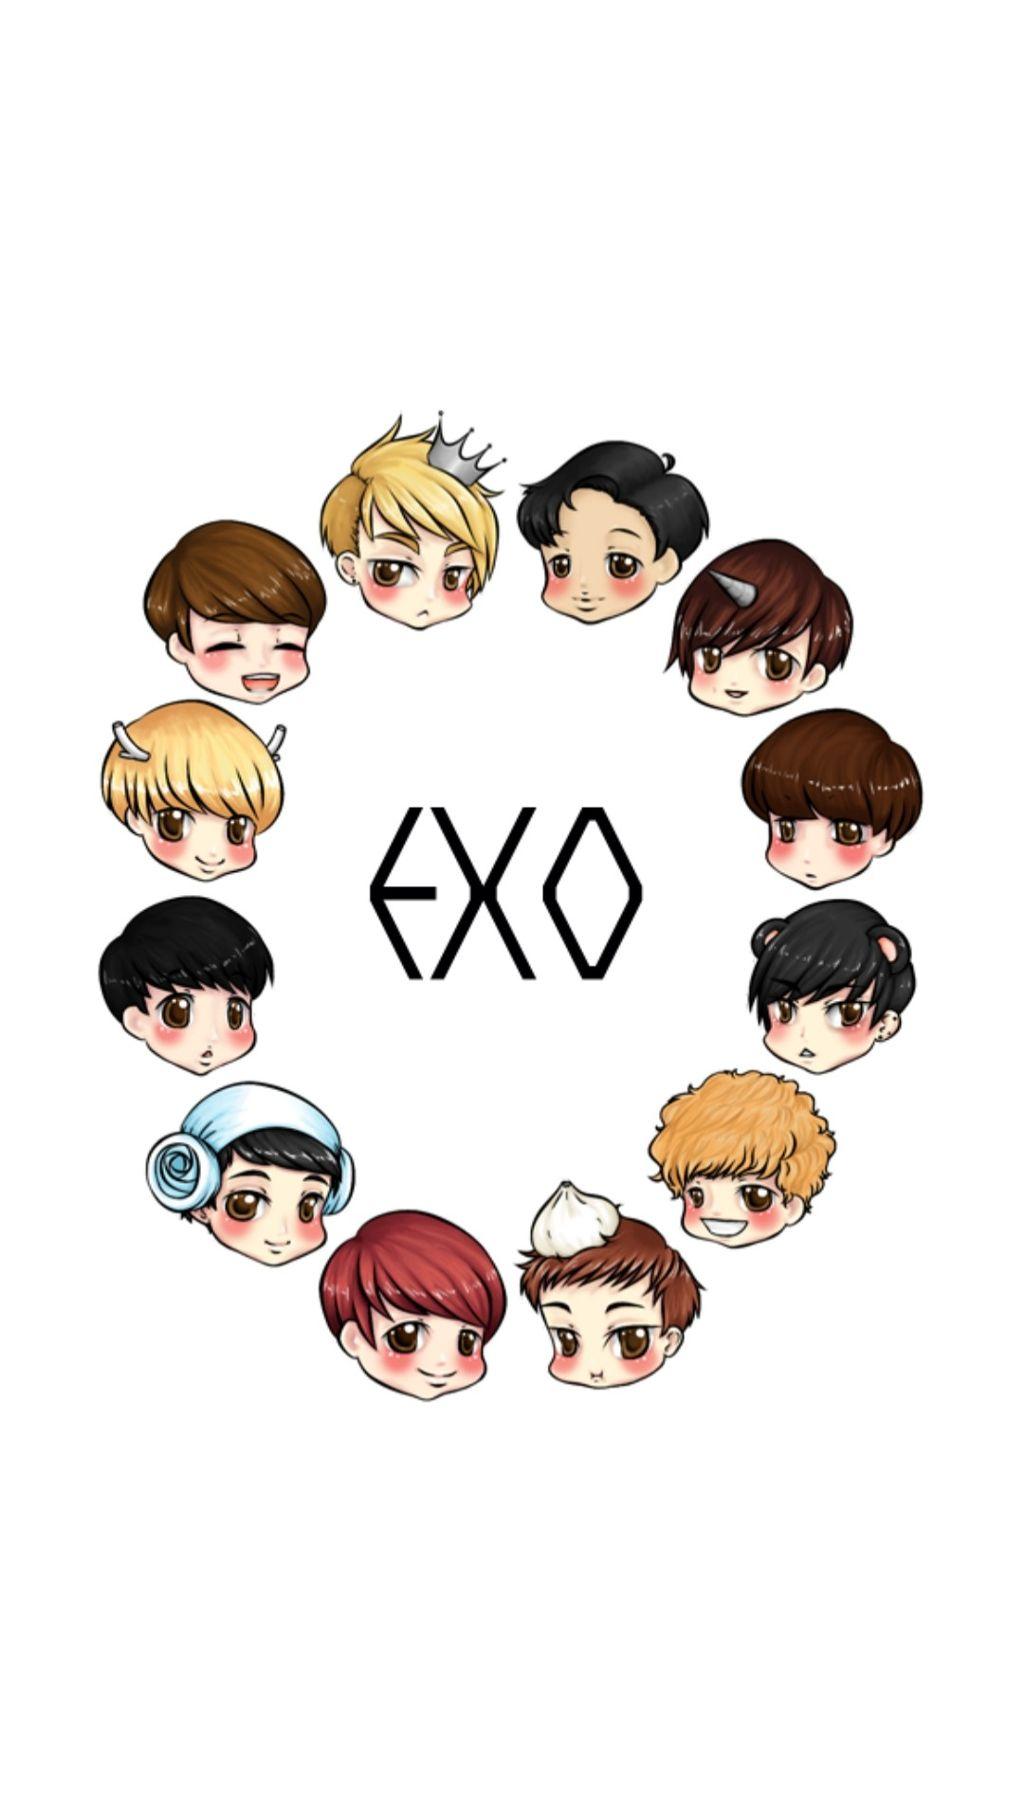 Exo Cute Cartoon Wallpaper